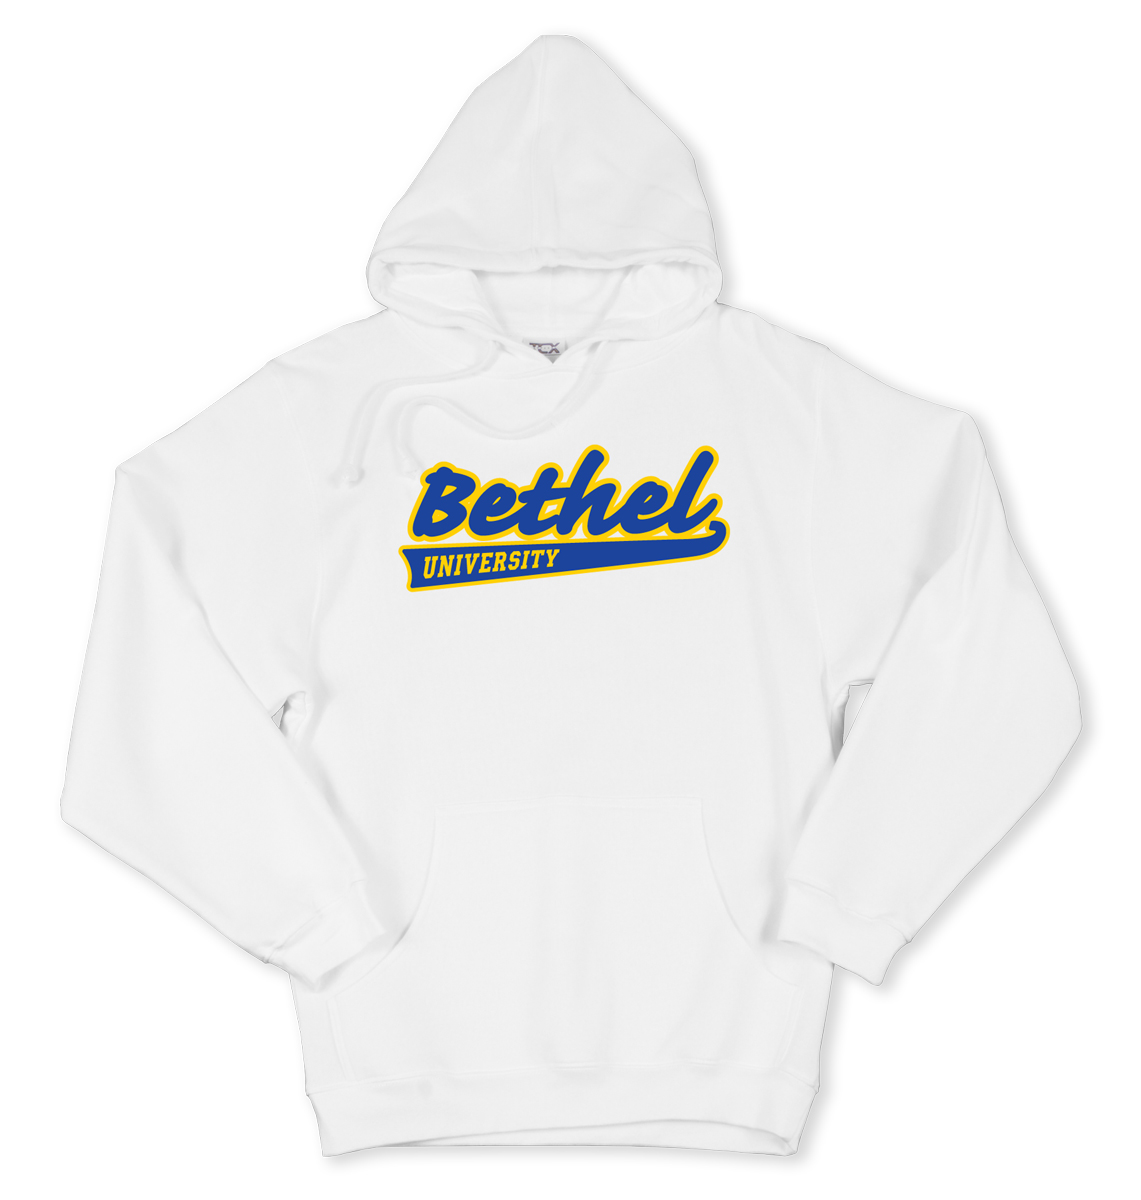 Hooded Sweatshirt from The Cotton Exchange